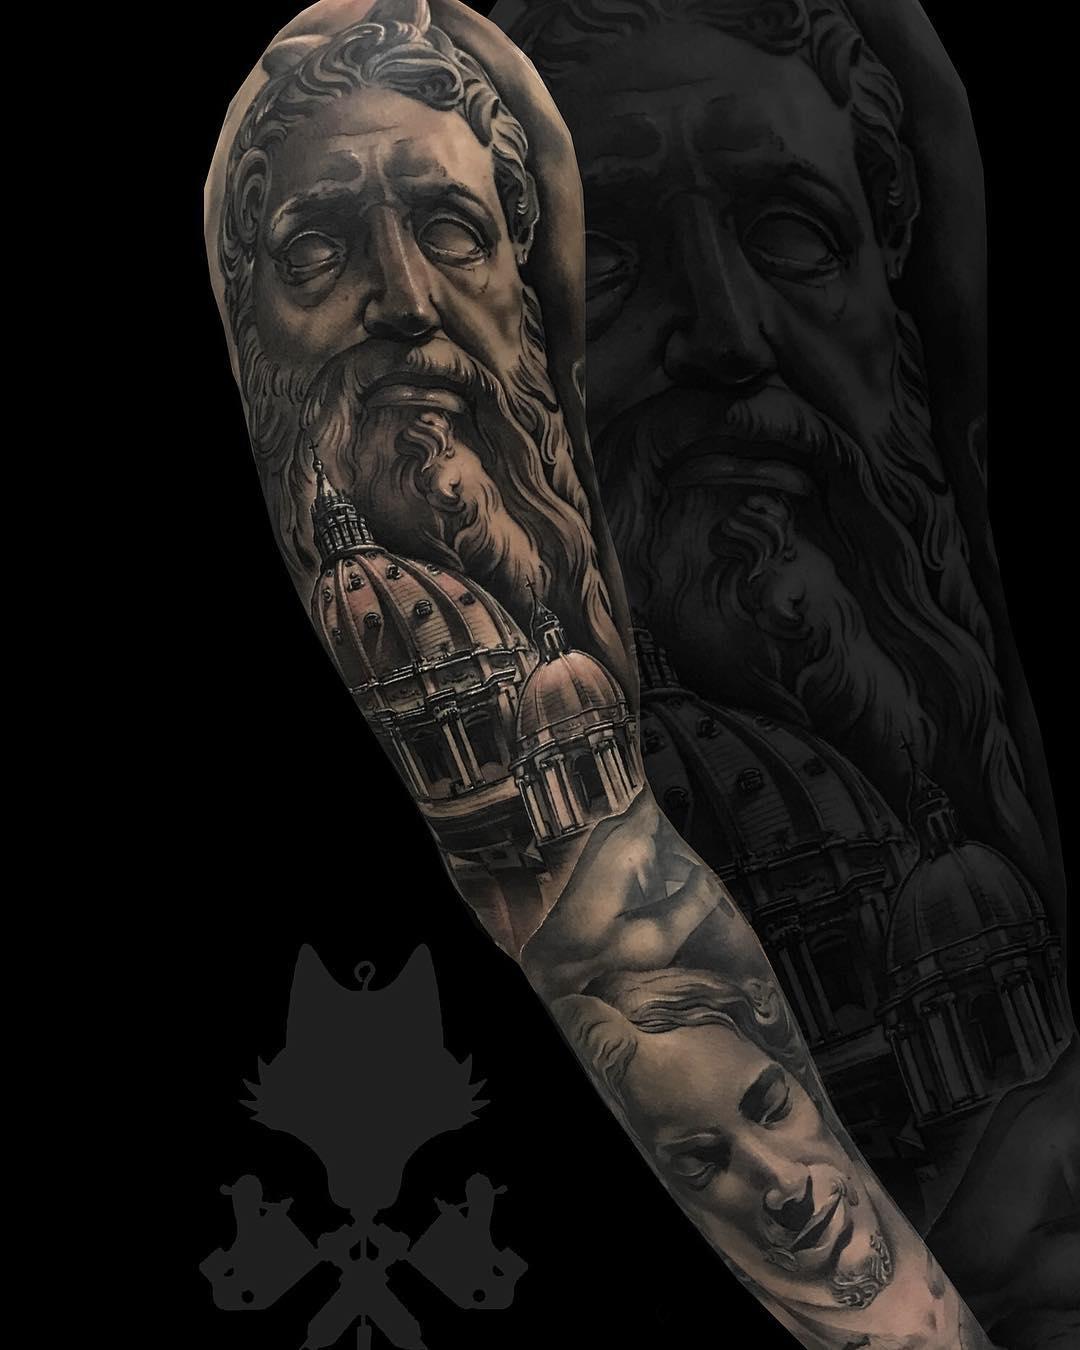 Tatuaje Zeus Estatua Arquitectura Realismo Blancoynegro Hombre Brazo